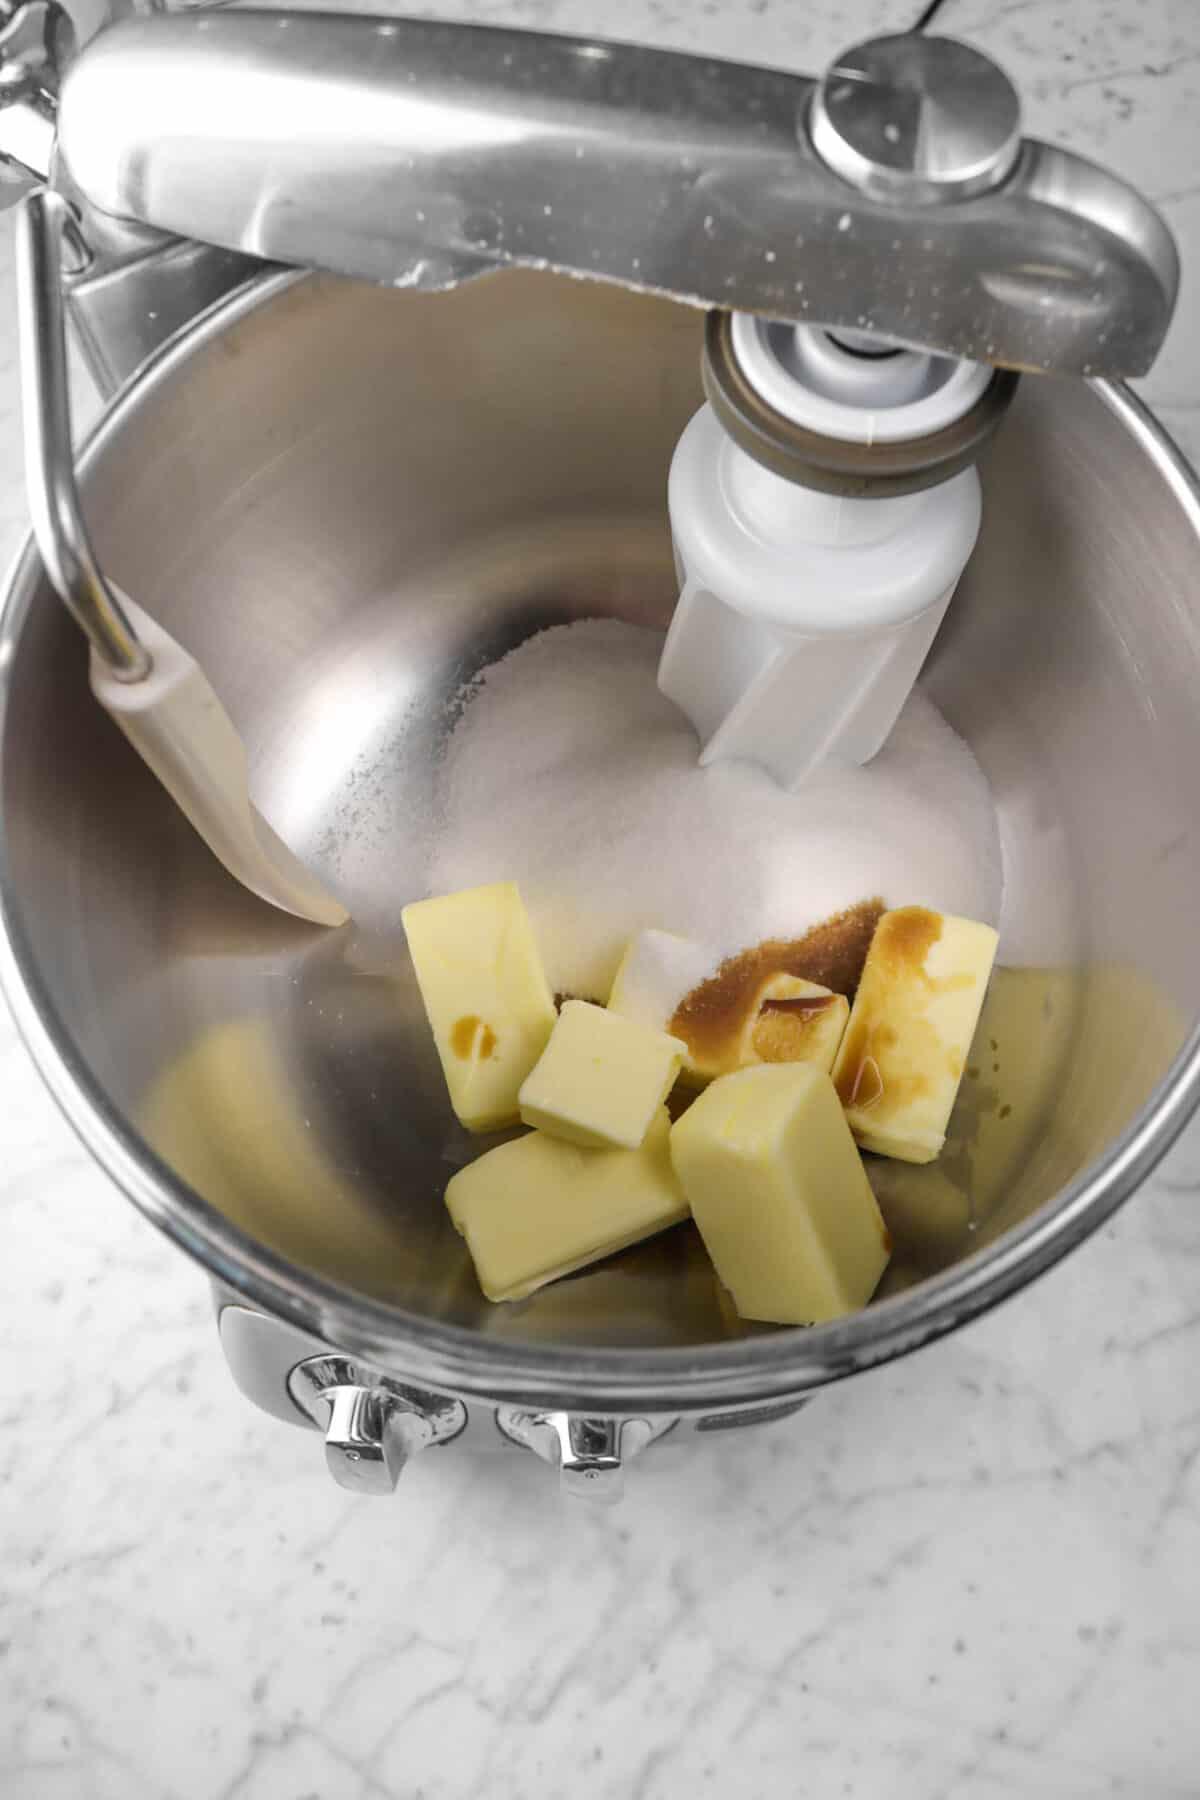 butter, vanilla, and sugar in a mixer bowl